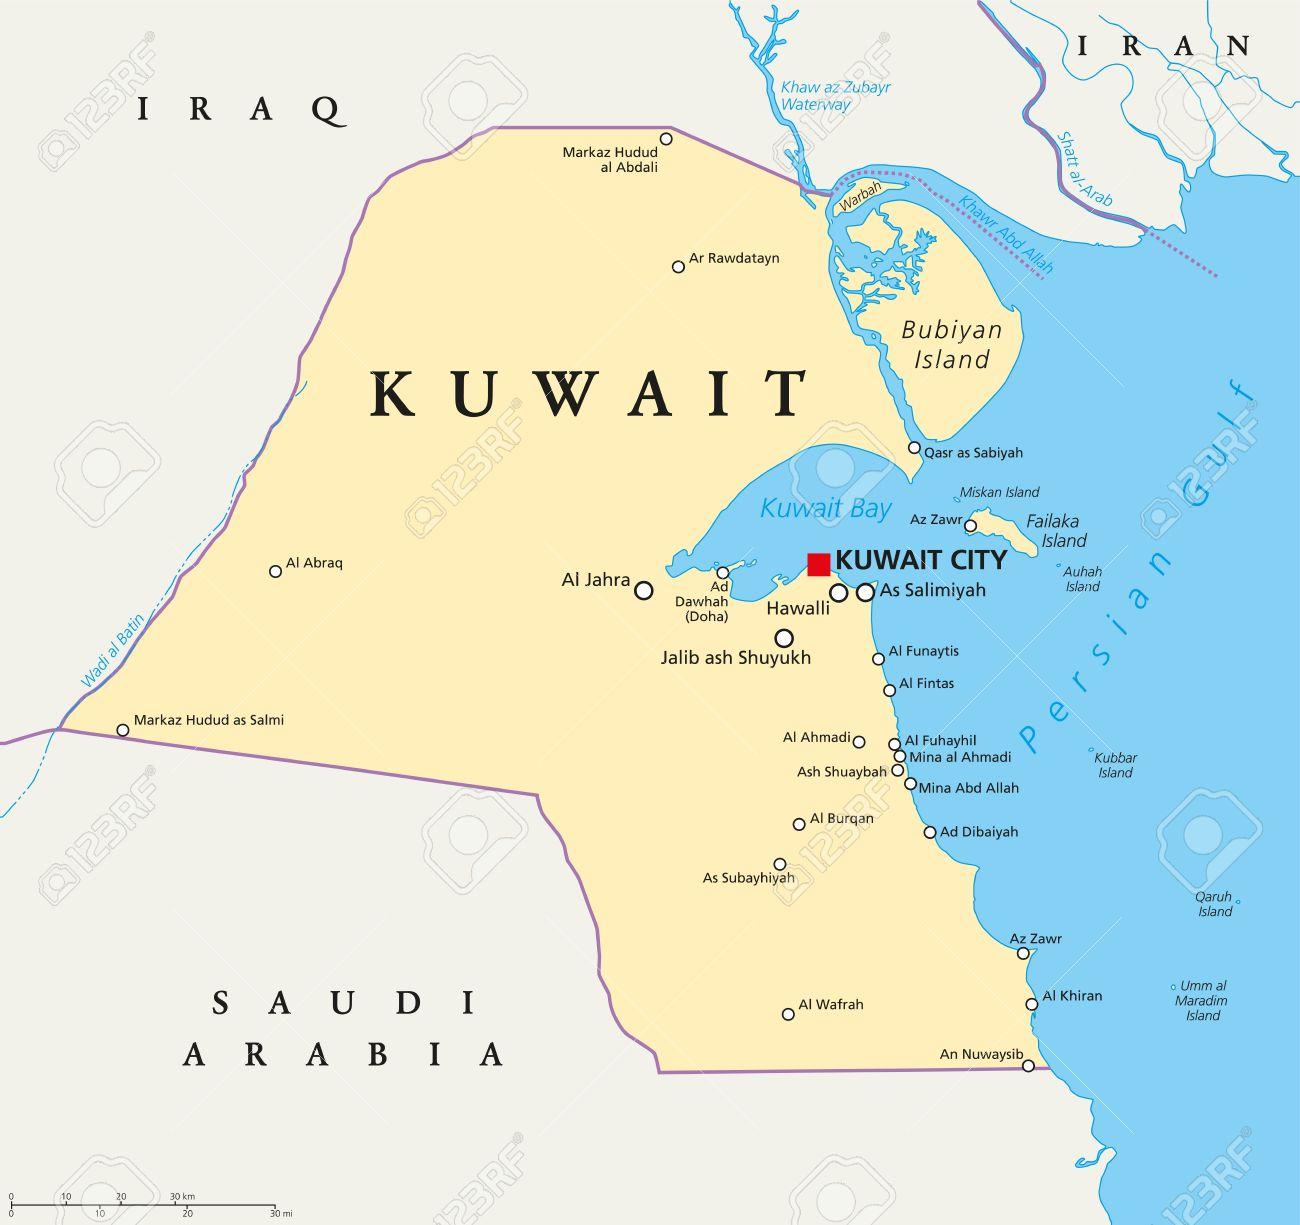 Kuwait Political Map.Kuwait Political Map With Capital Kuwait City National Borders